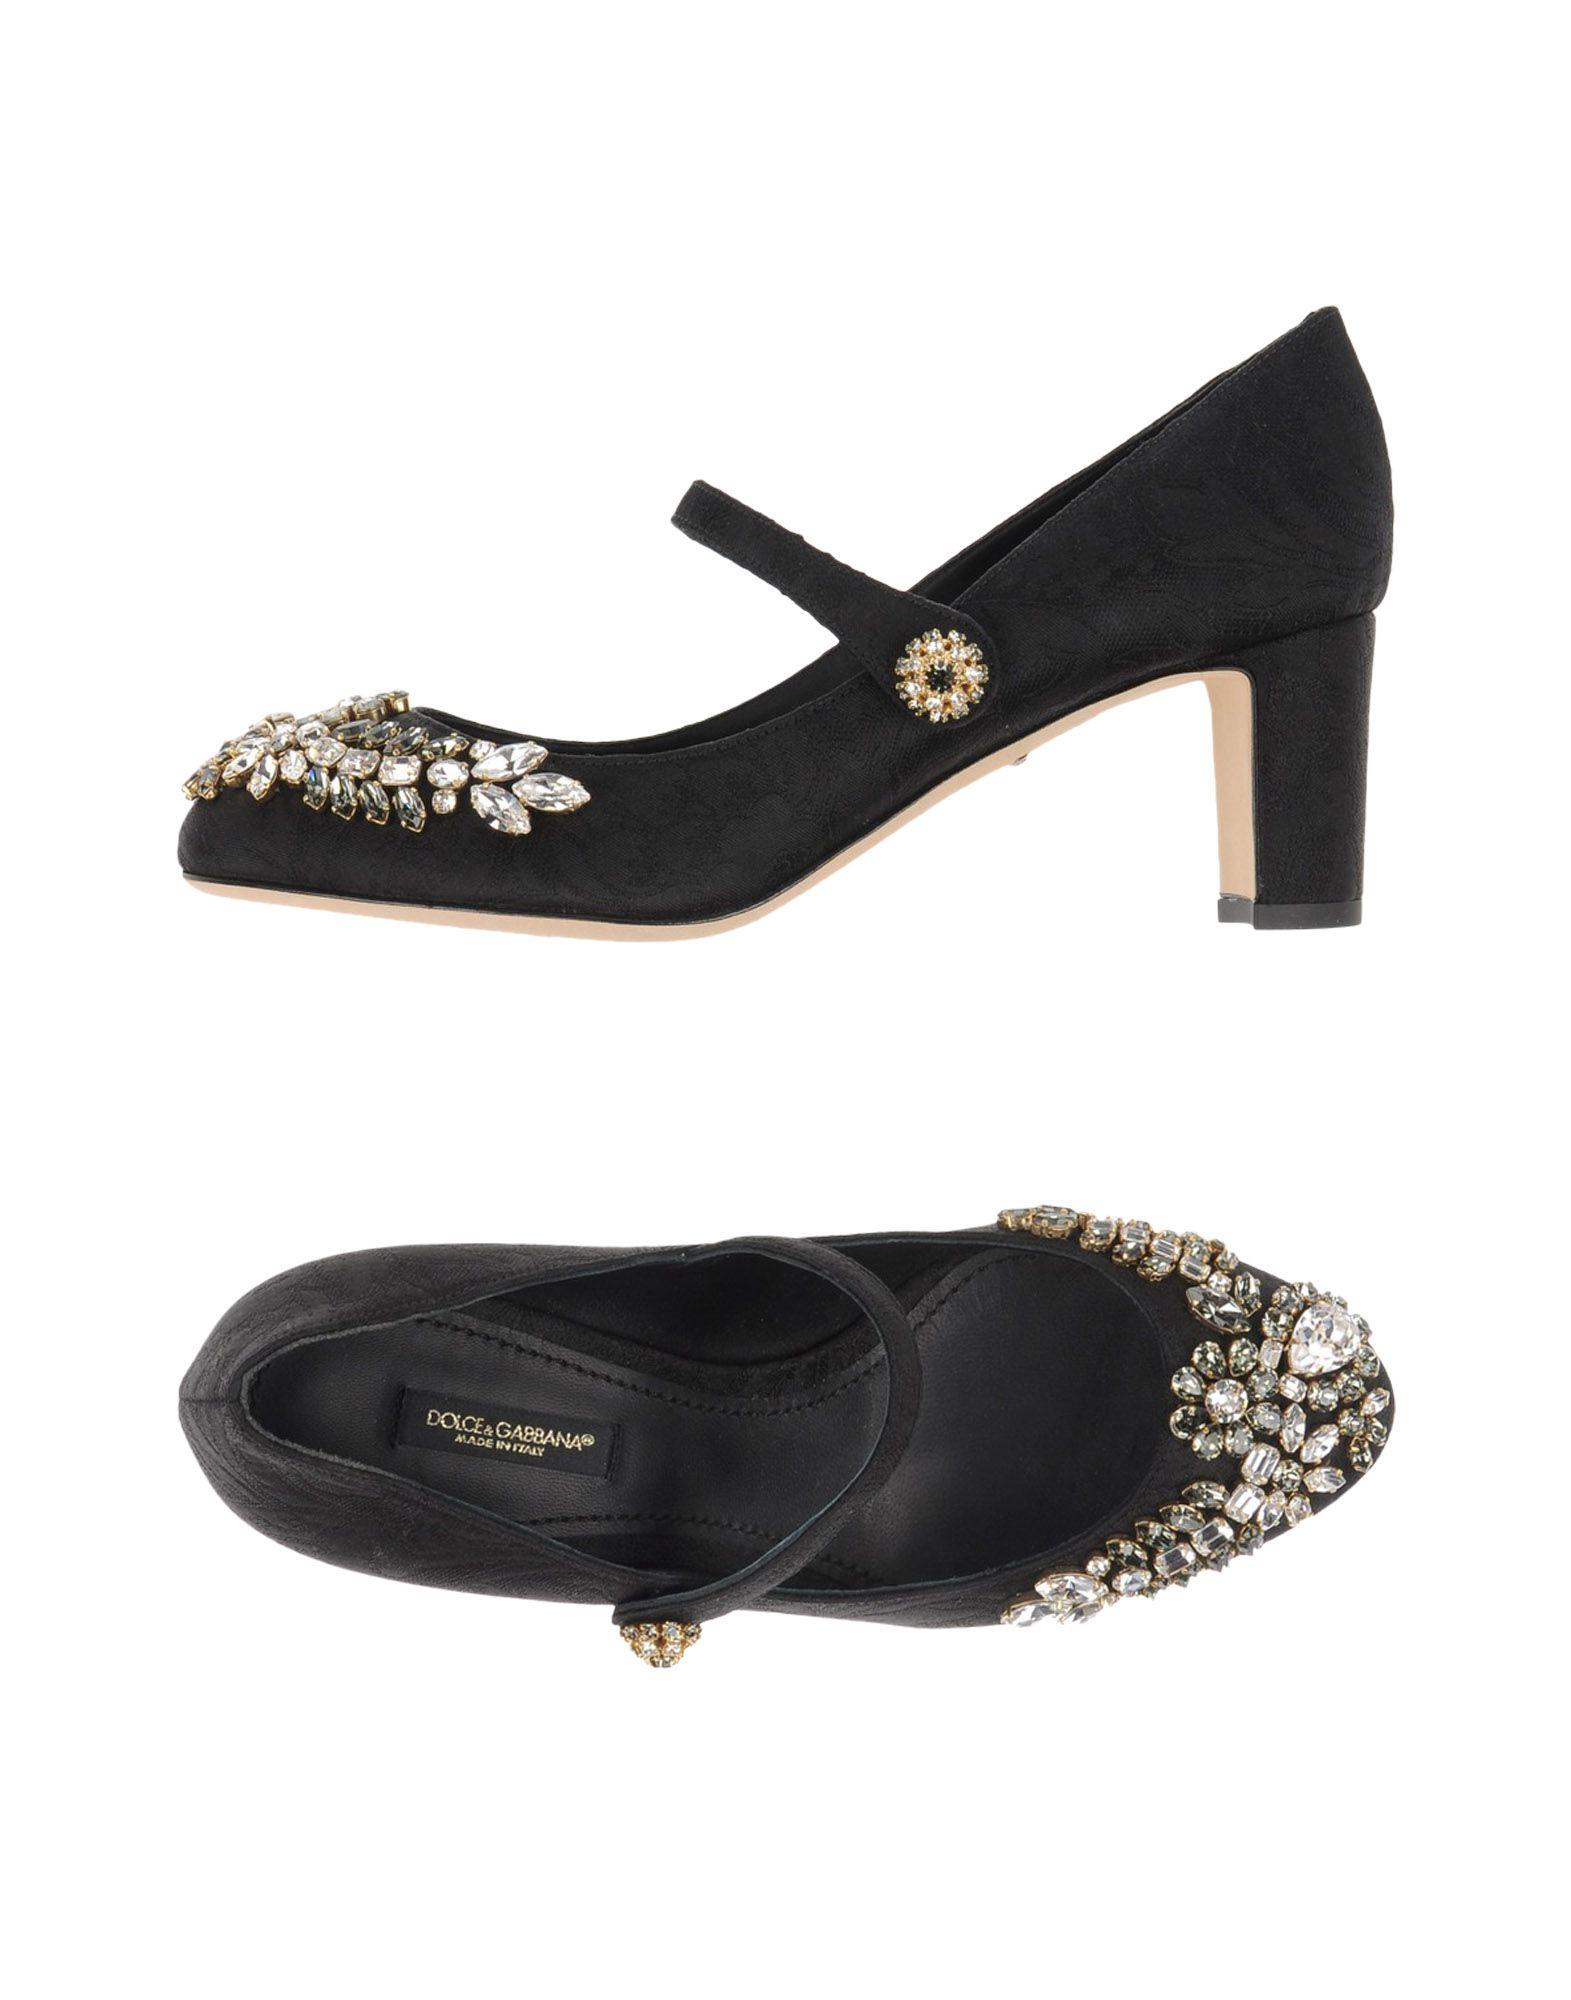 Dolce & Gabbana Pumps aussehende Damen  11217987CXGünstige gut aussehende Pumps Schuhe dc2faa